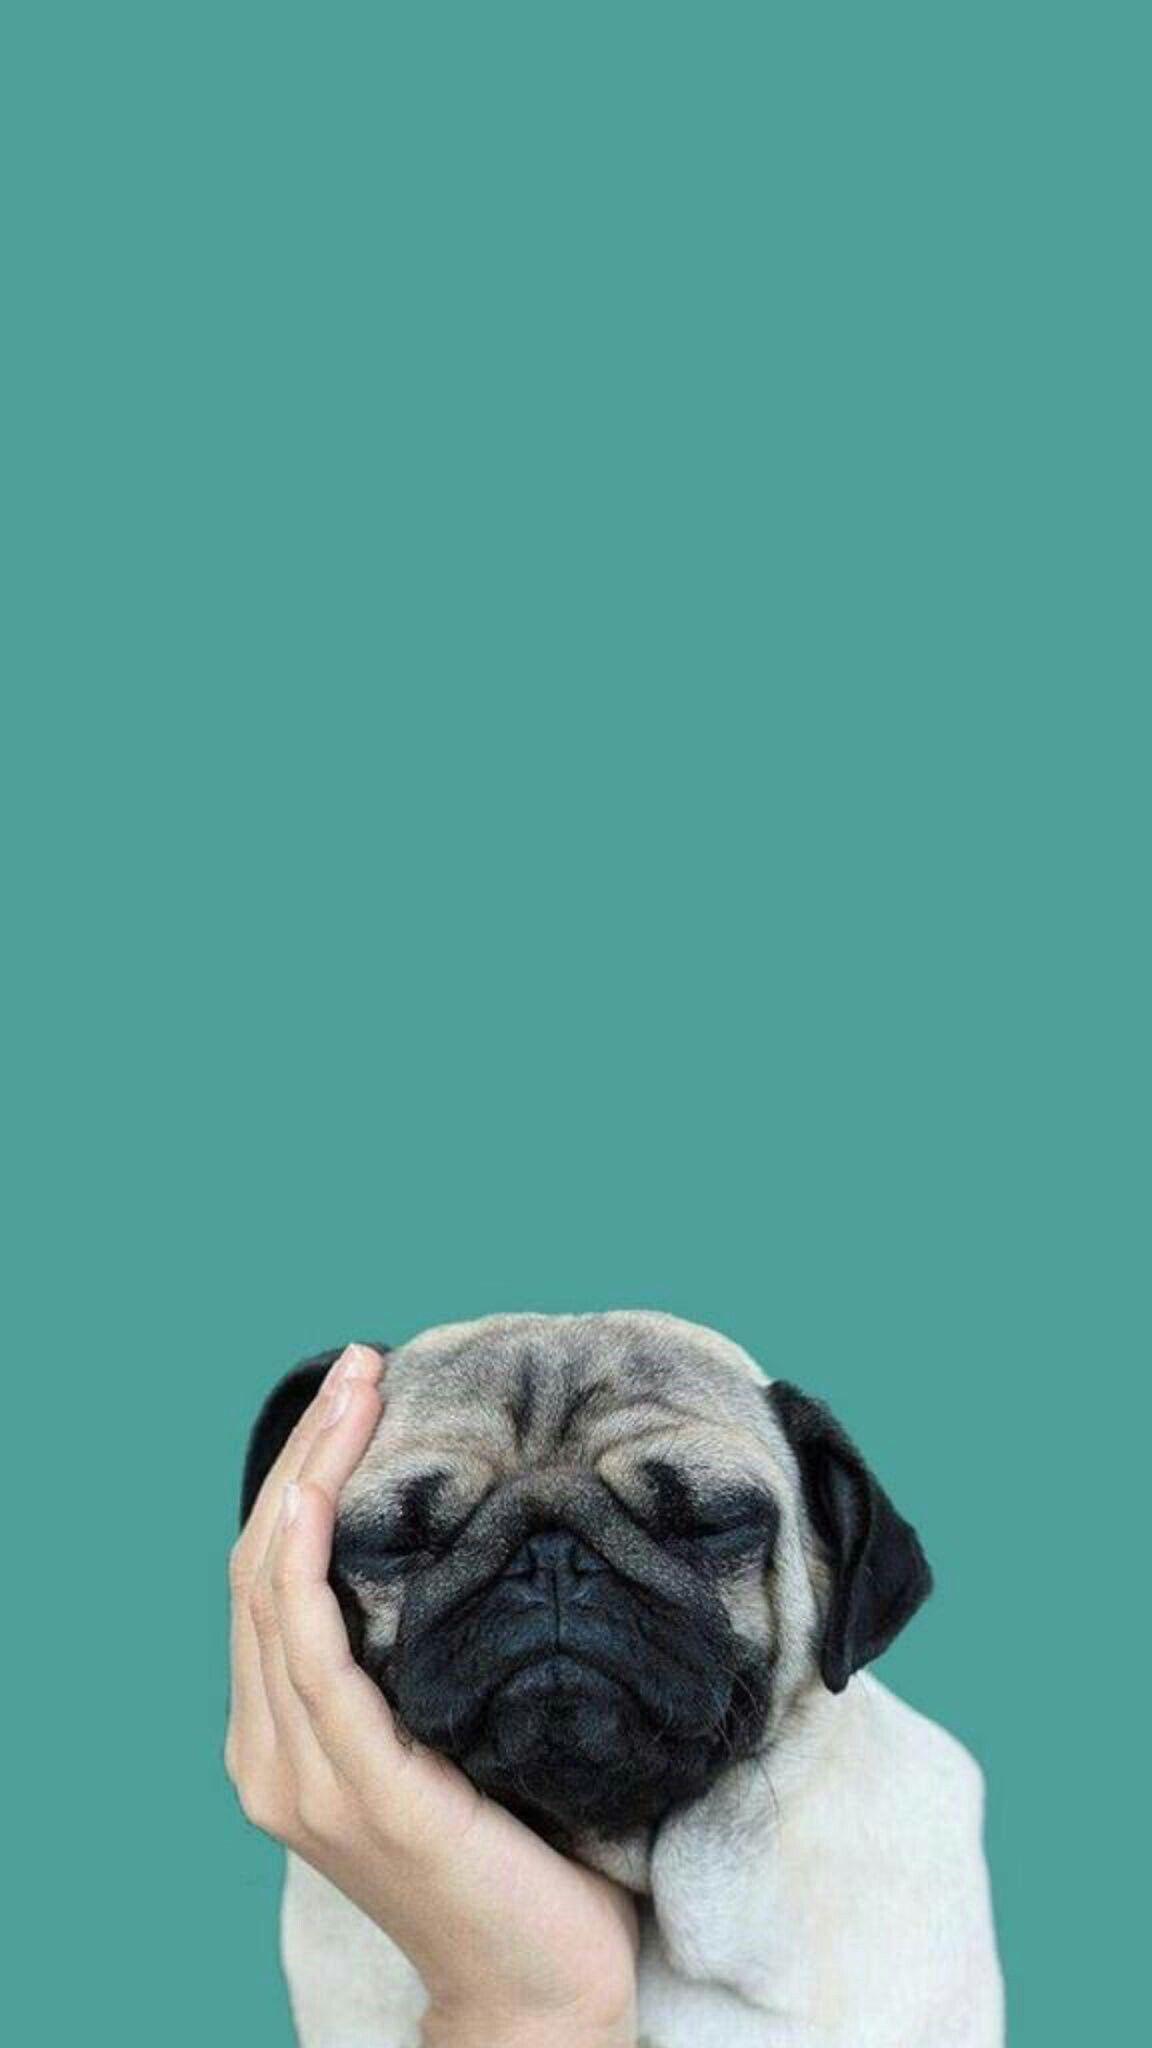 Pug Wallpaper Hd Phone 2270562 Hd Wallpaper